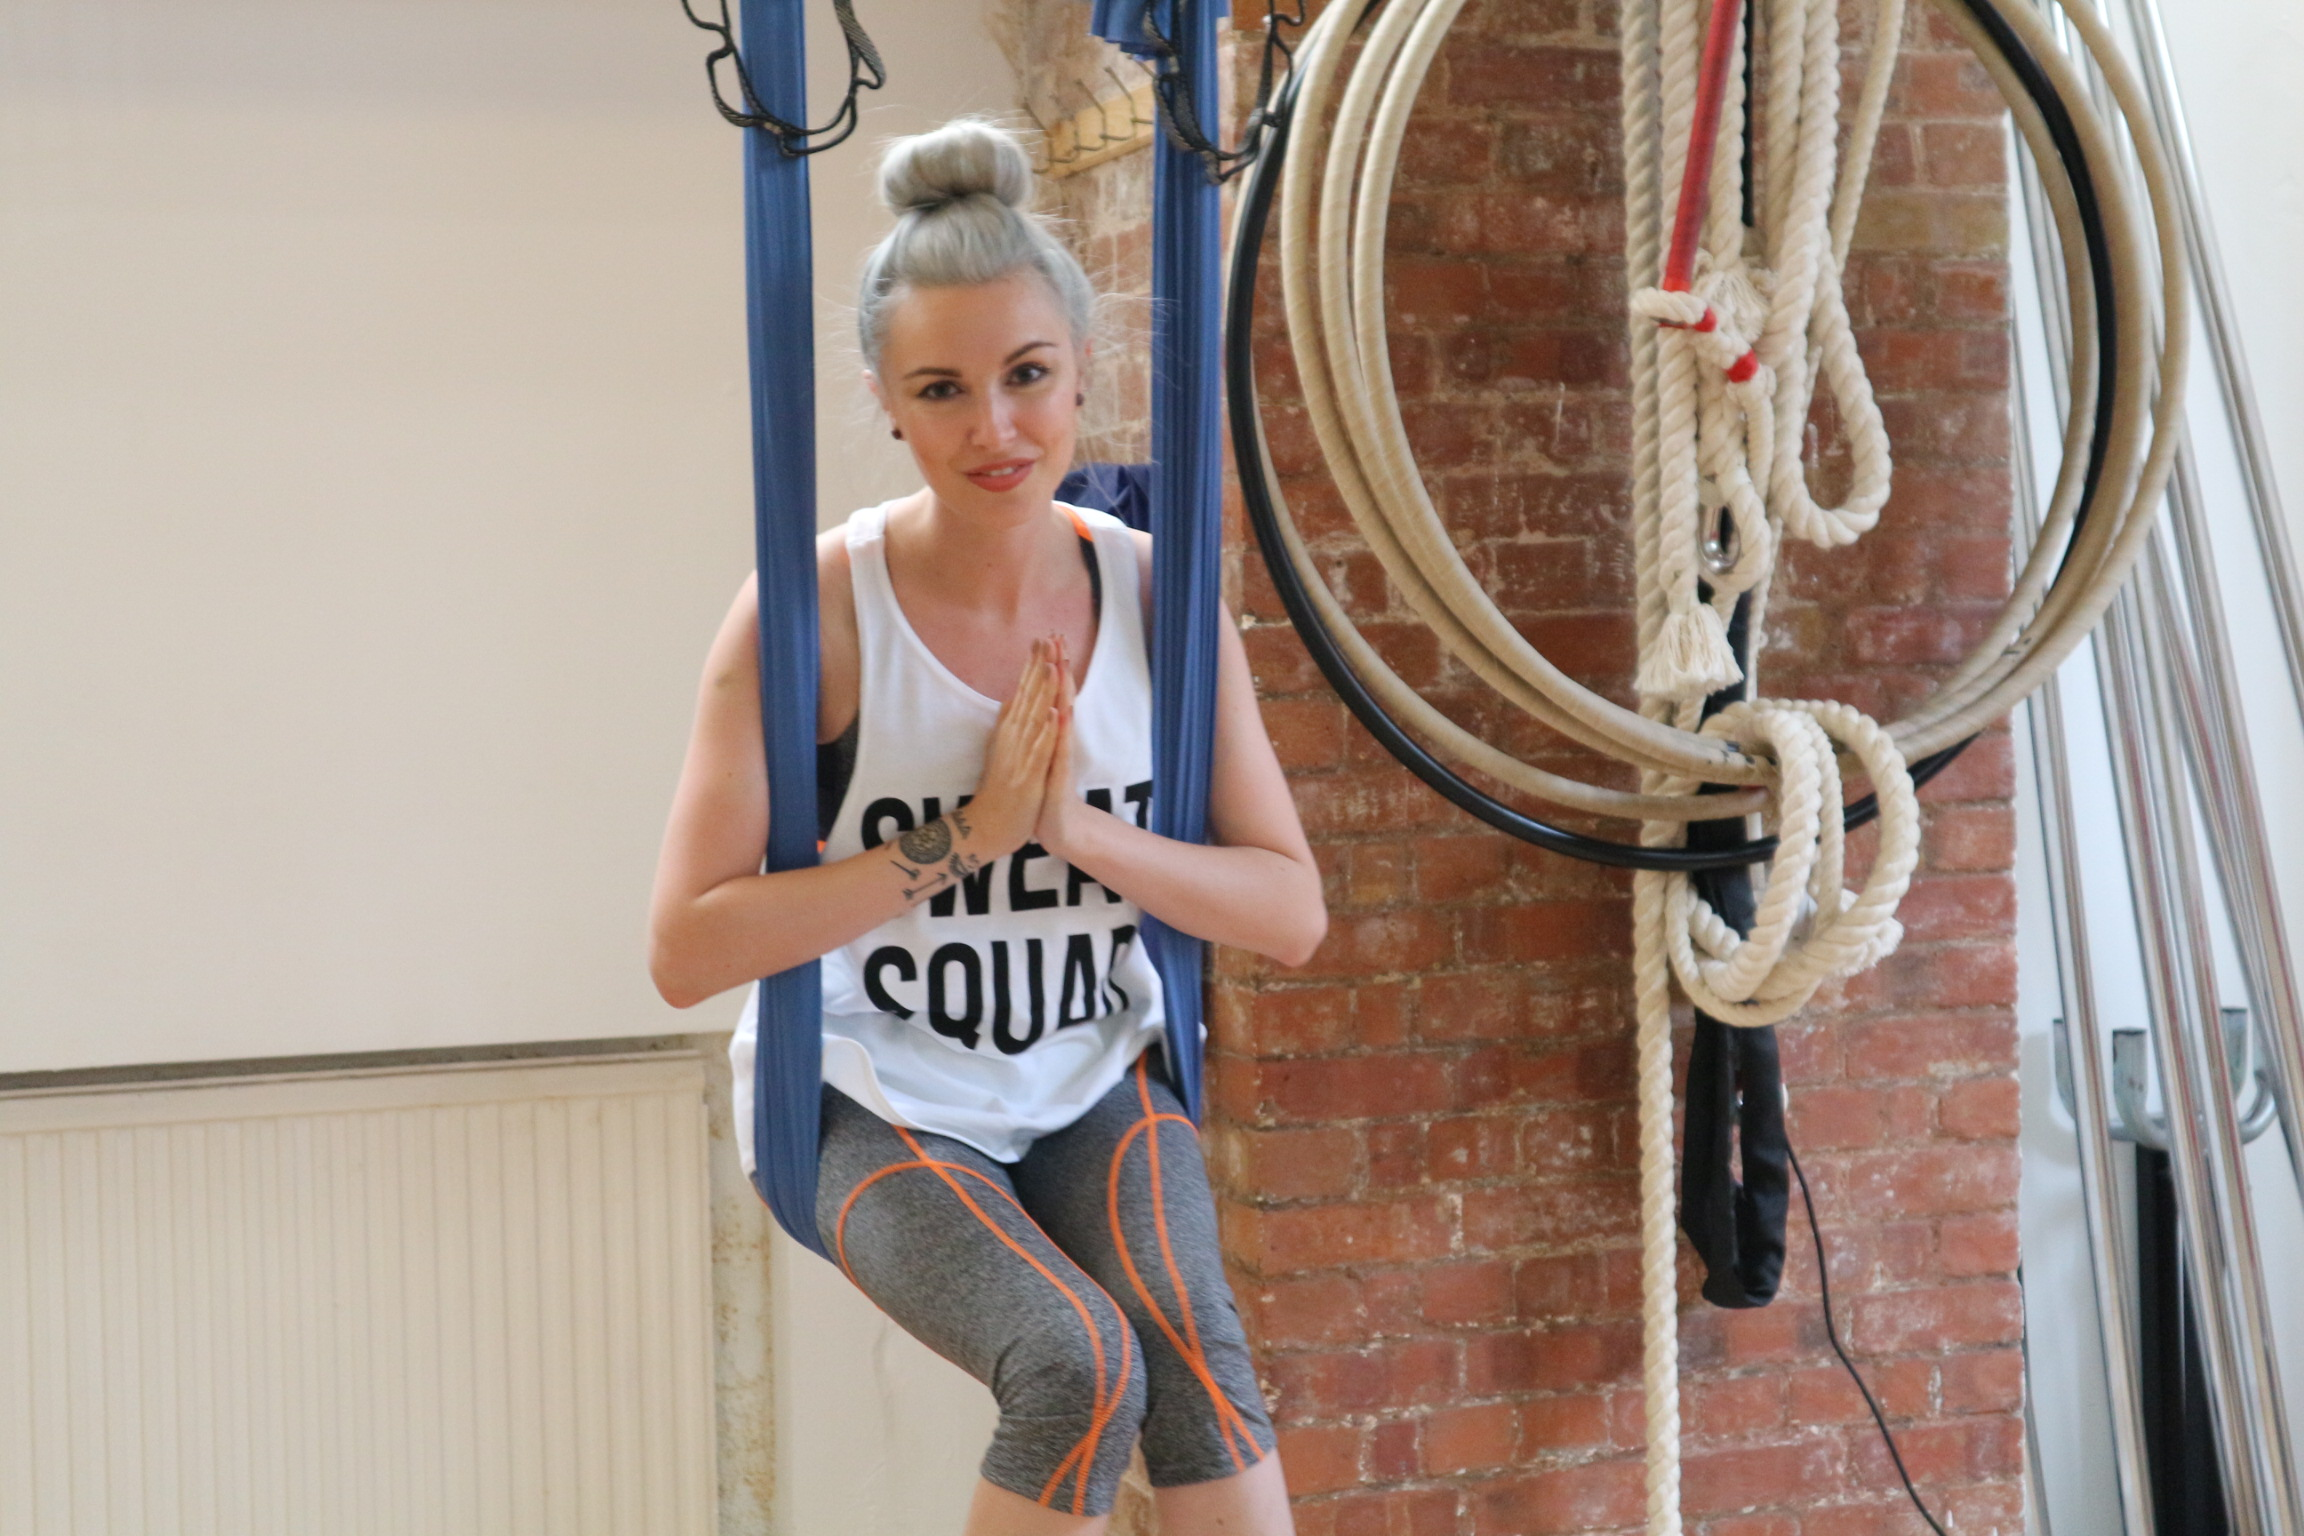 Anti-Gravity Yoga with Boohoo - Kitty Cowell